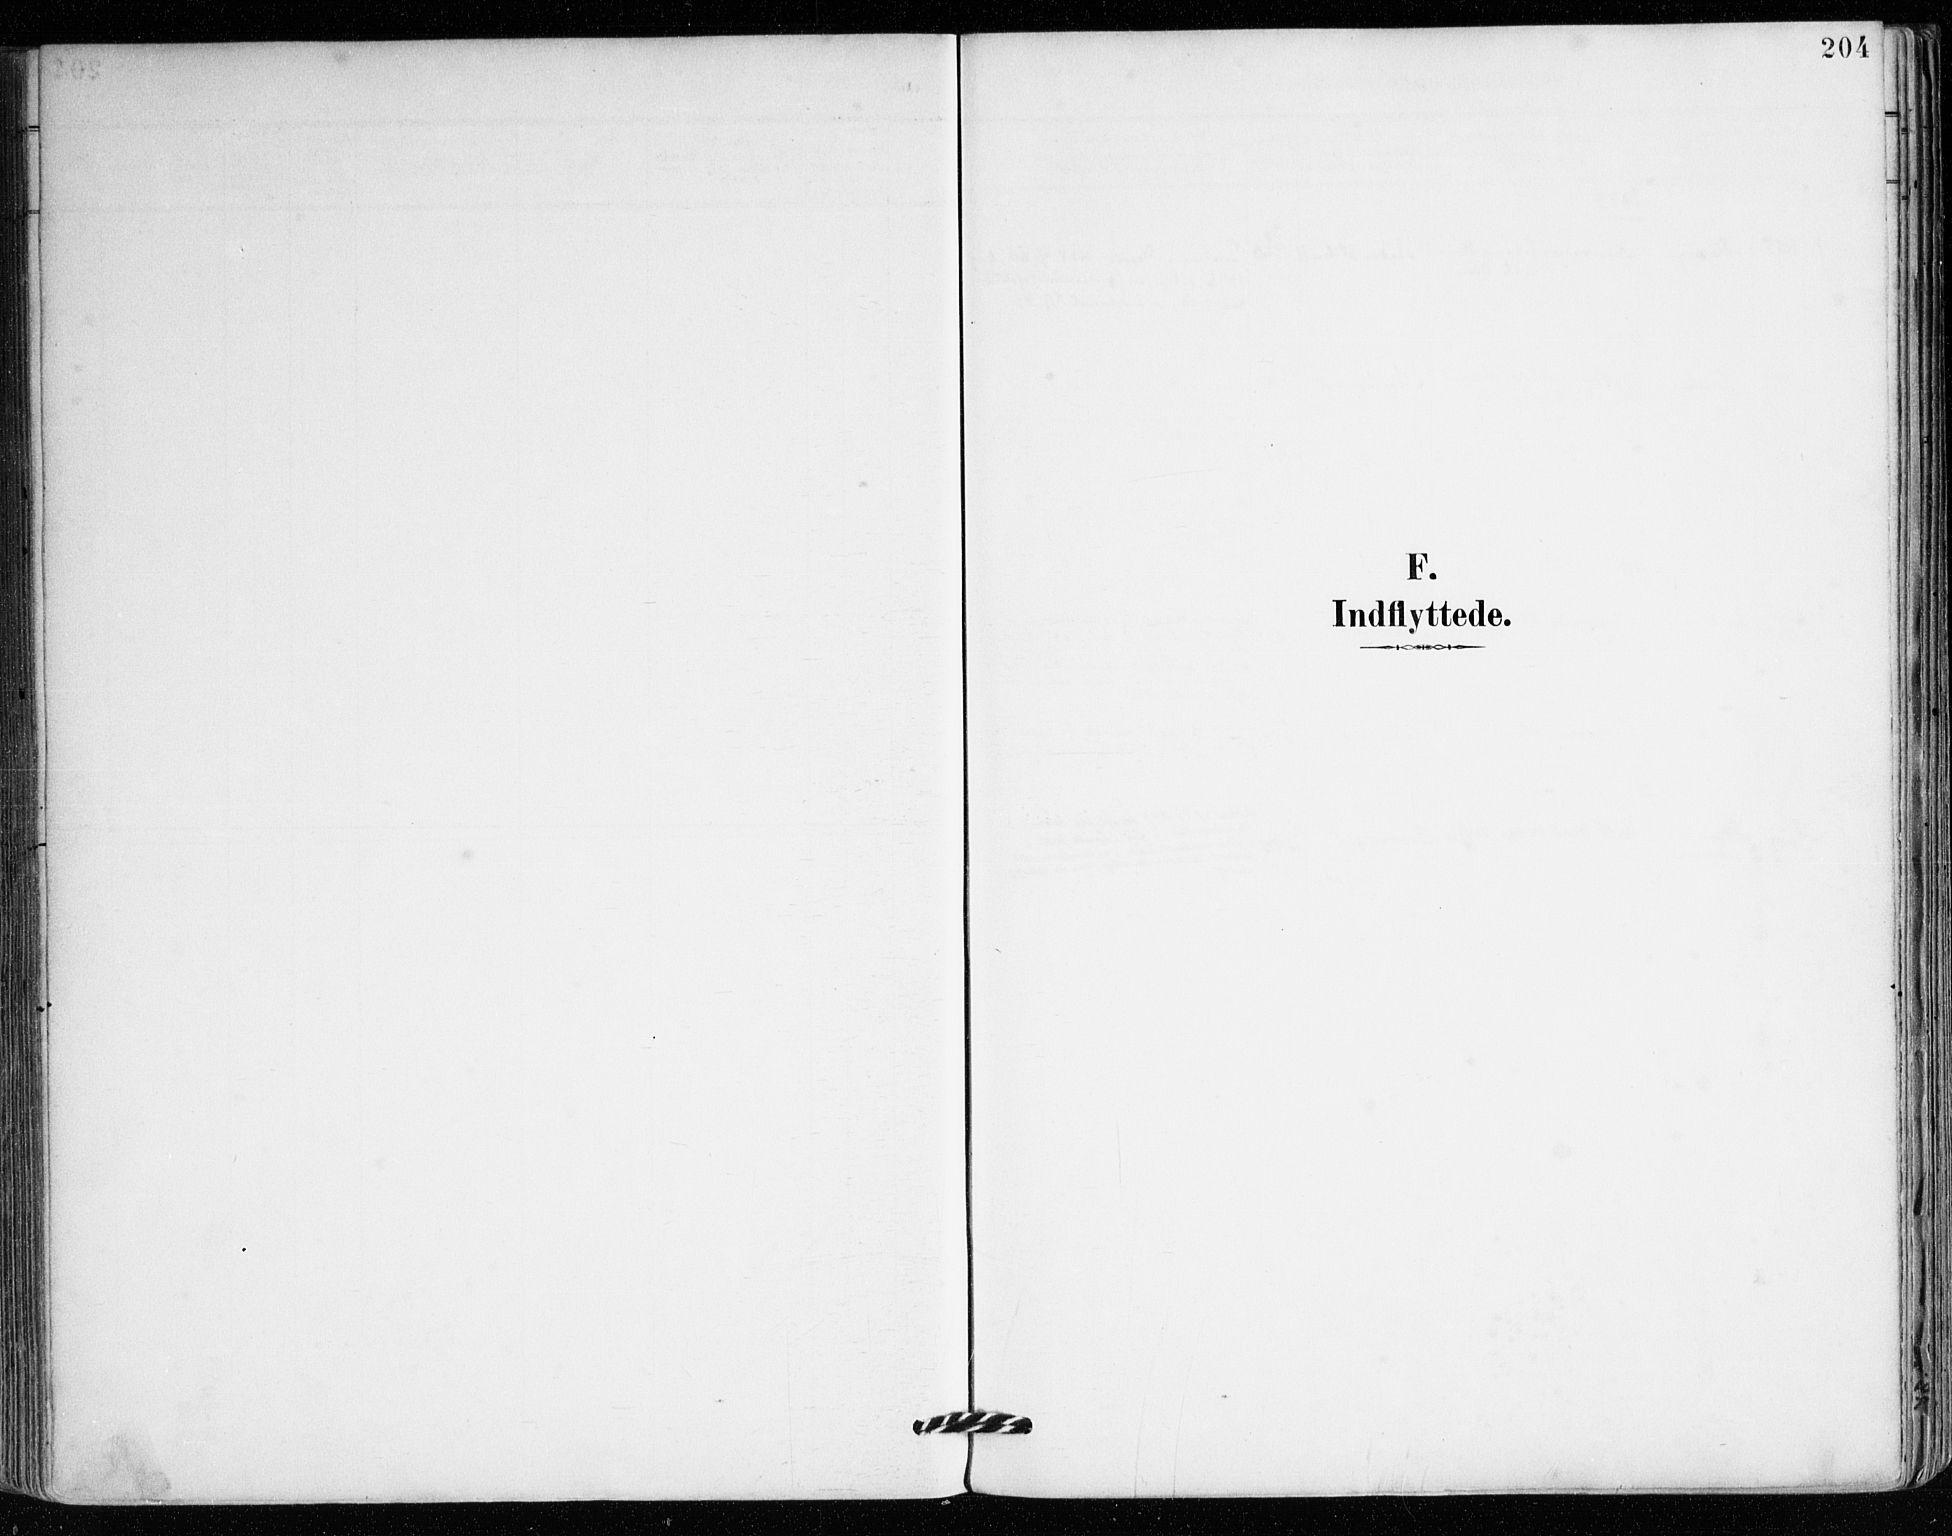 SAB, Mariakirken Sokneprestembete, H/Haa/L0008: Ministerialbok nr. A 8, 1893-1942, s. 204